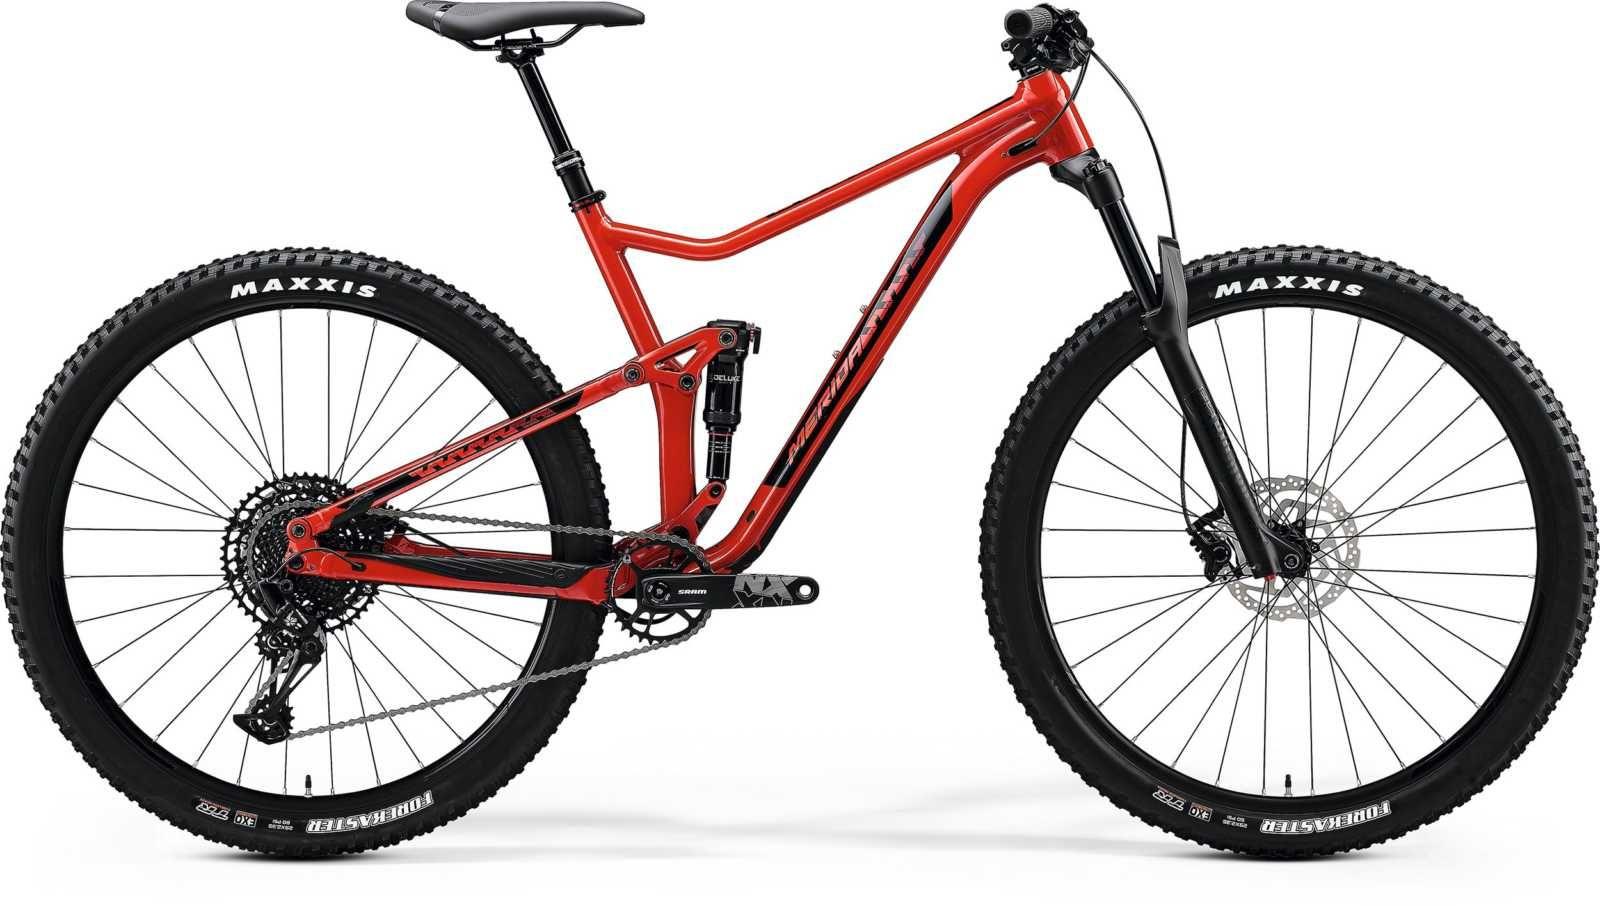 Pin En Bicicletas De Tuvalum